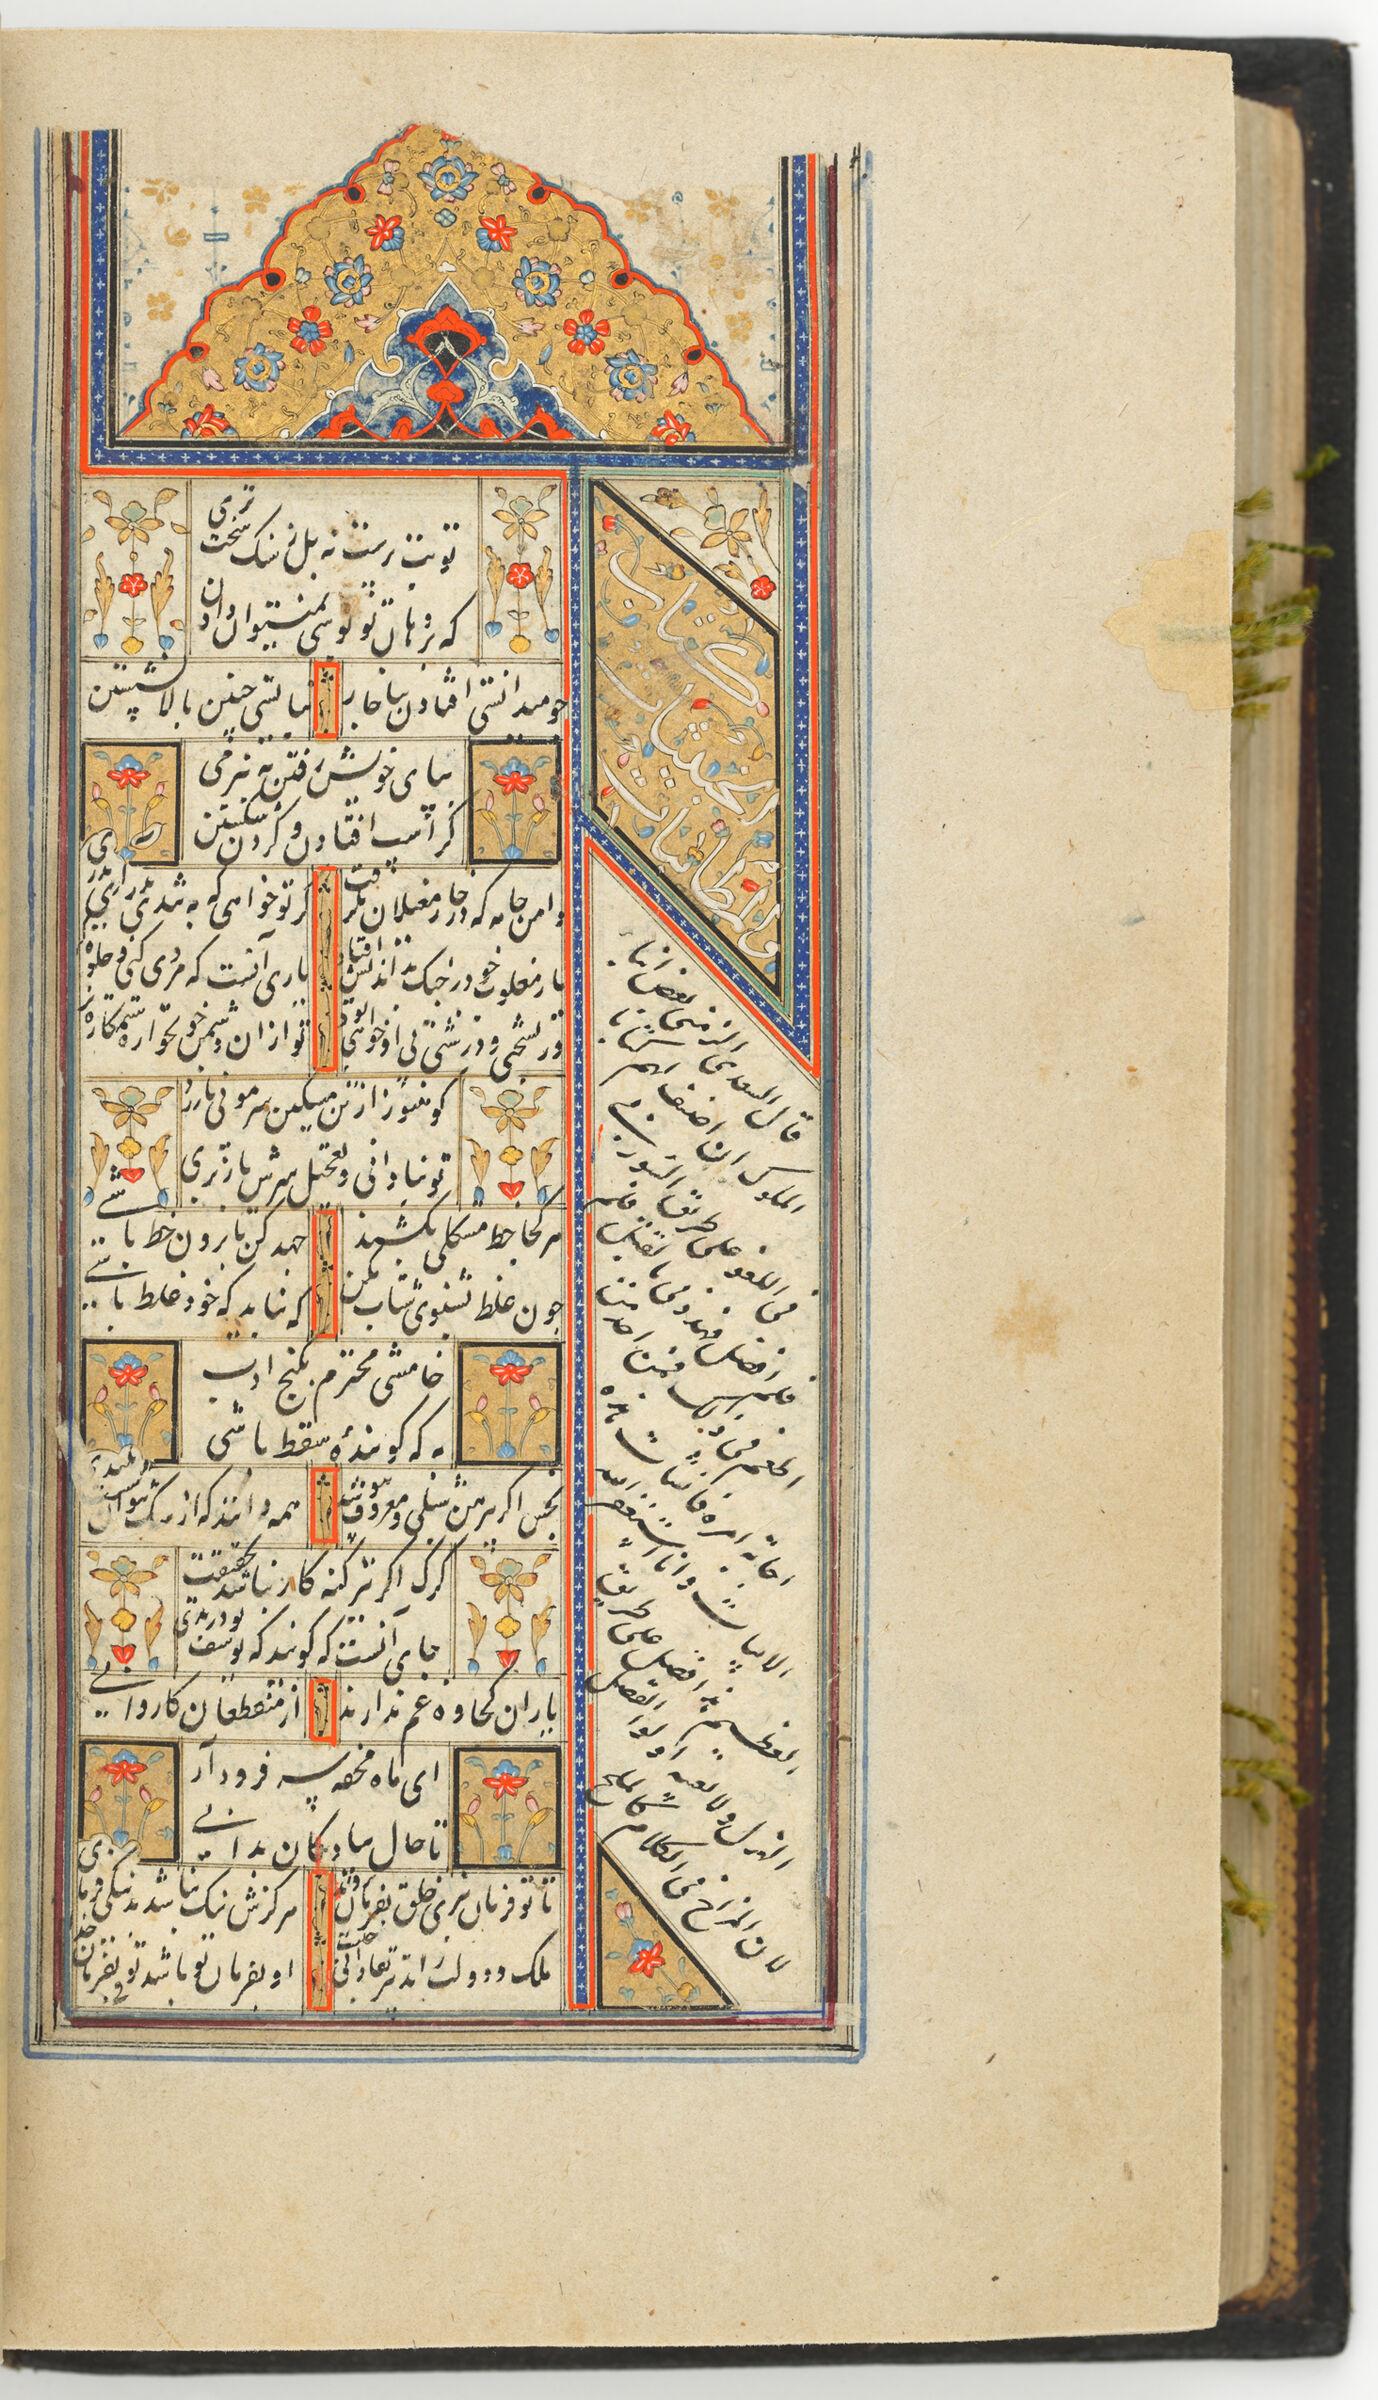 "Text Folio With An Illuminated Heading (Text Recto; Text  With An Illuminated Heading Verso Of Folio 330), From A Manuscript Of The Kulliyat Of Sa'di""."